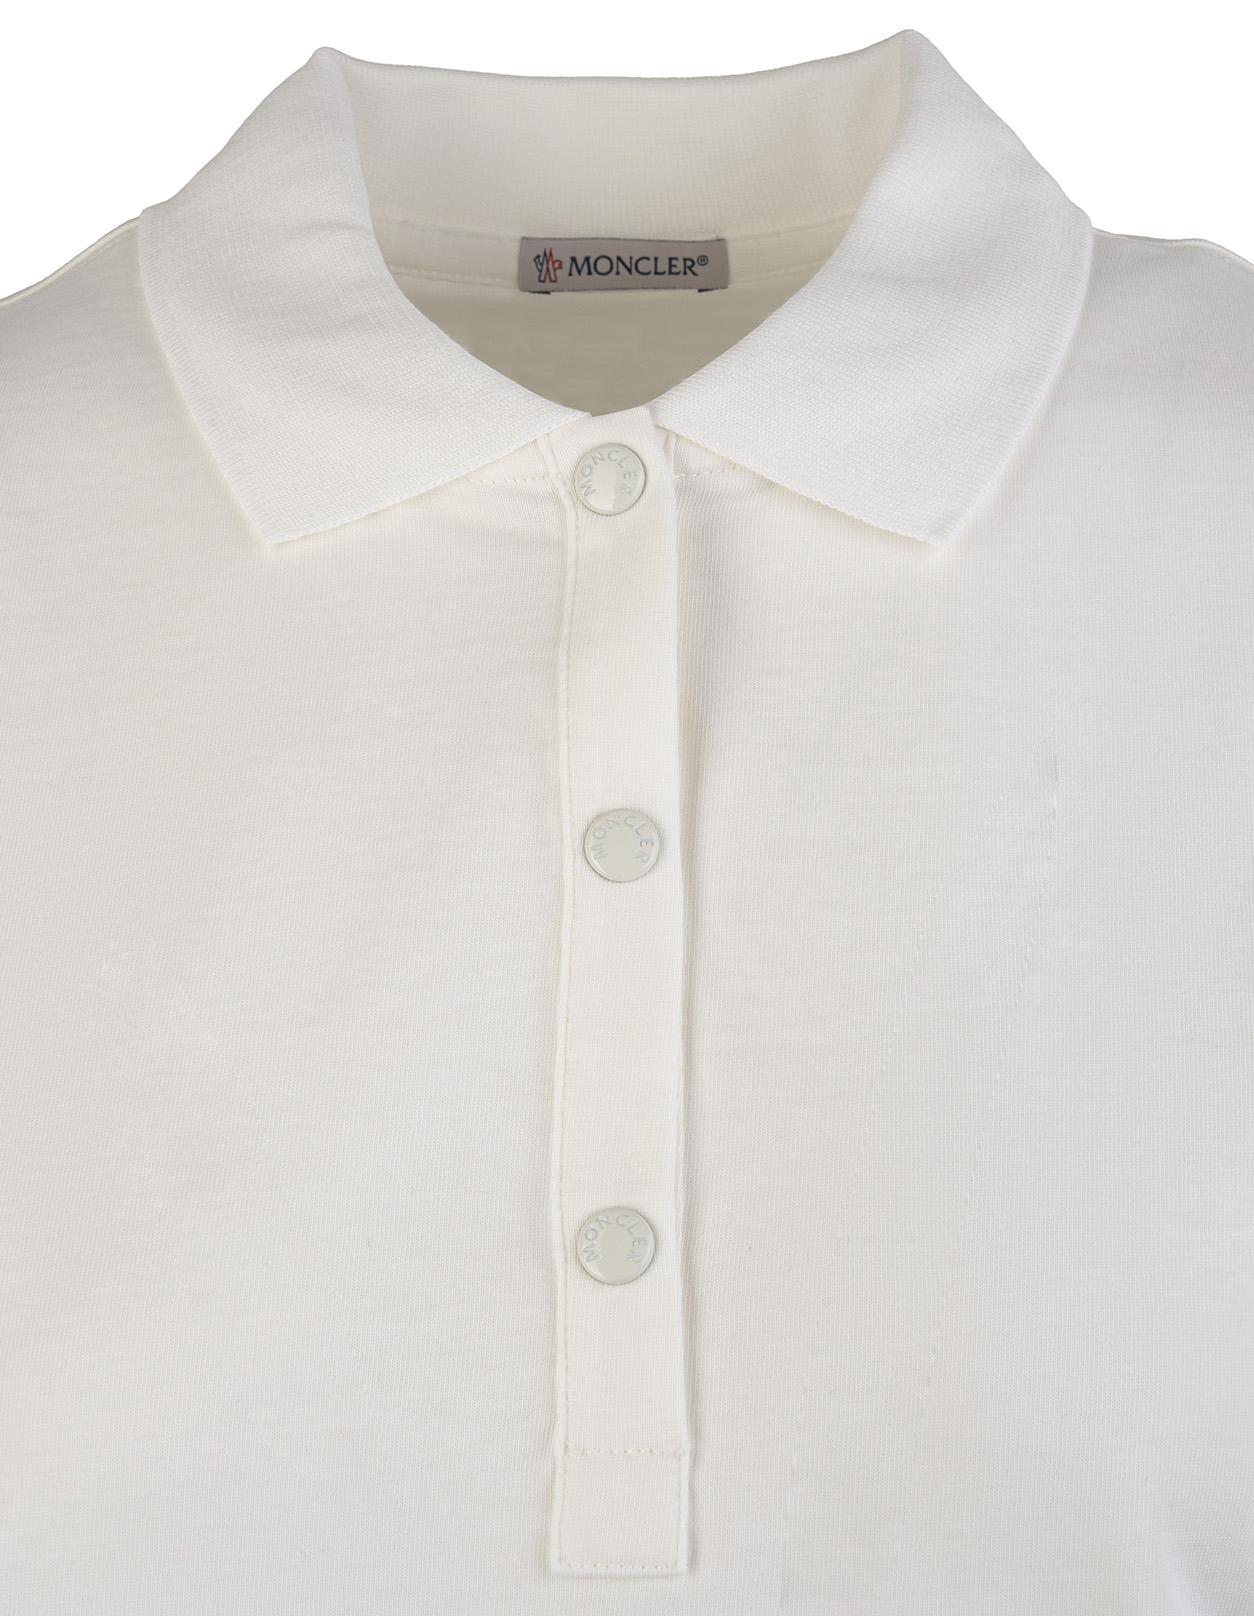 e415ec680 Embroidered Logo Cotton Polo Shirt - MONCLER - Russocapri